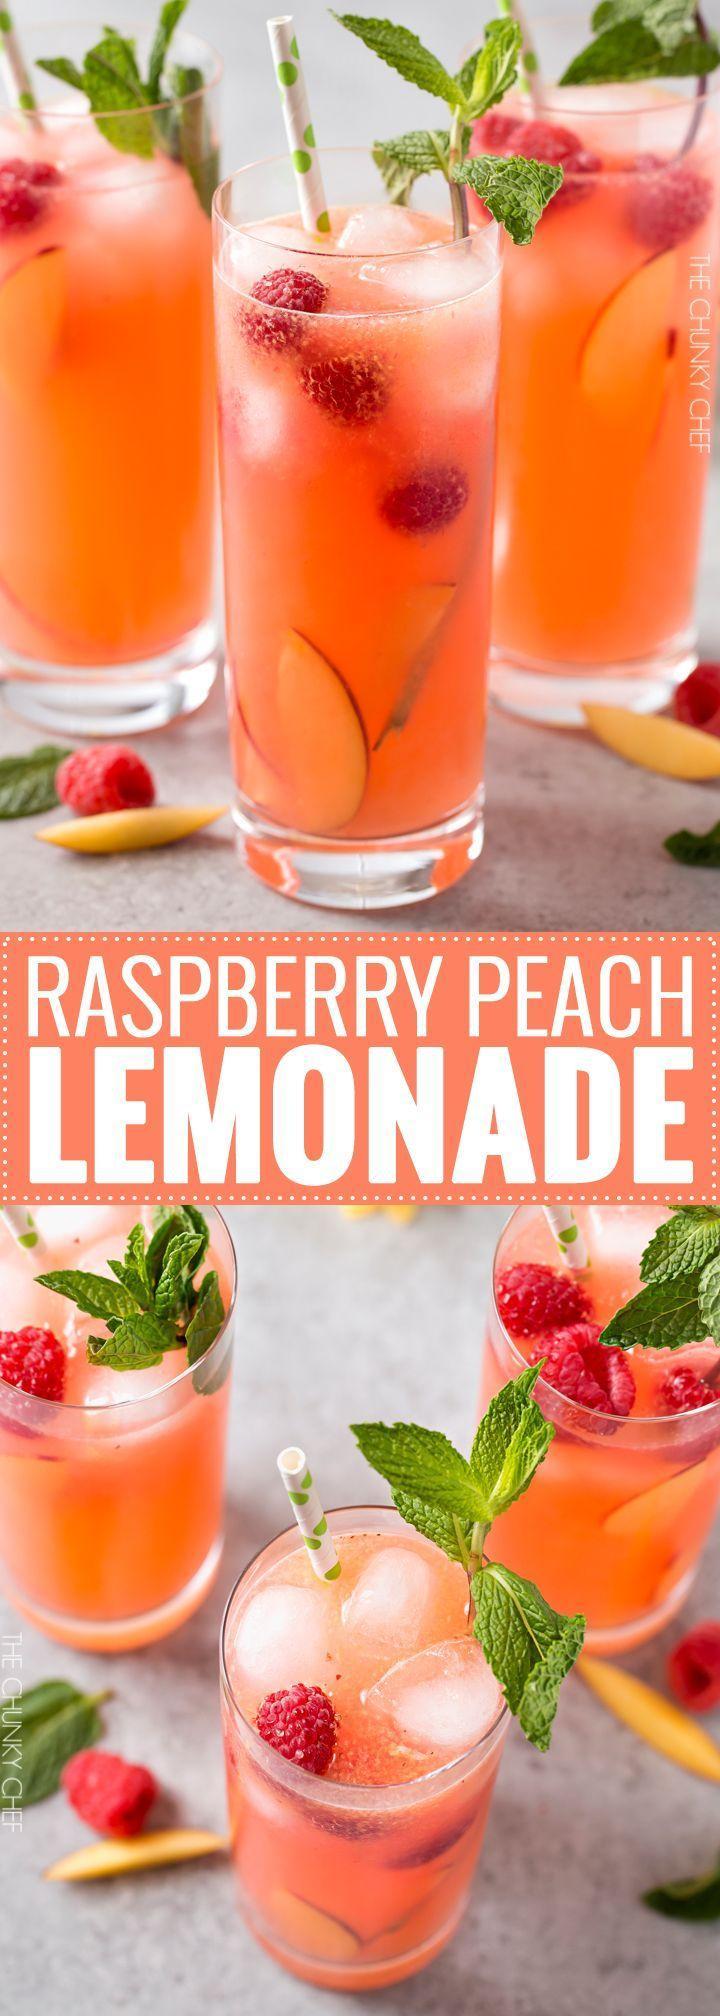 Mariage - Raspberry Peach Lemonade